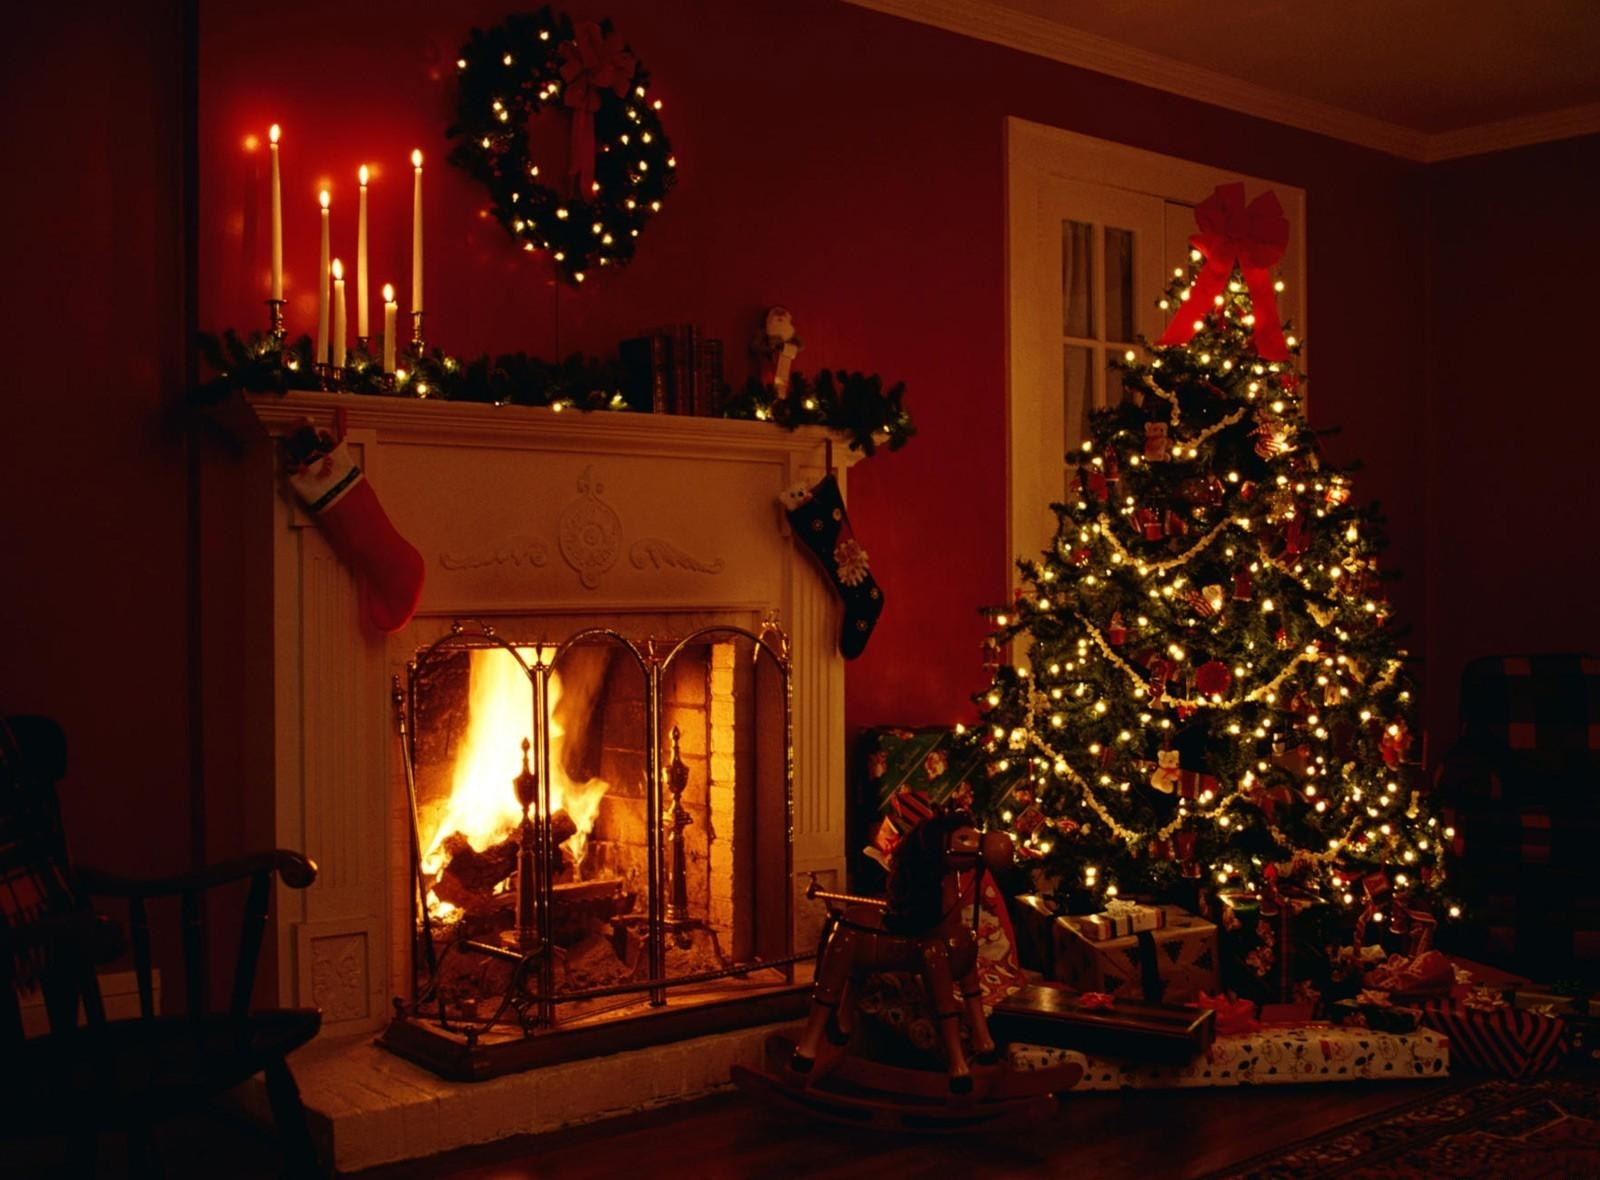 E Christmas Cards Not Animated 2015 1600x1180